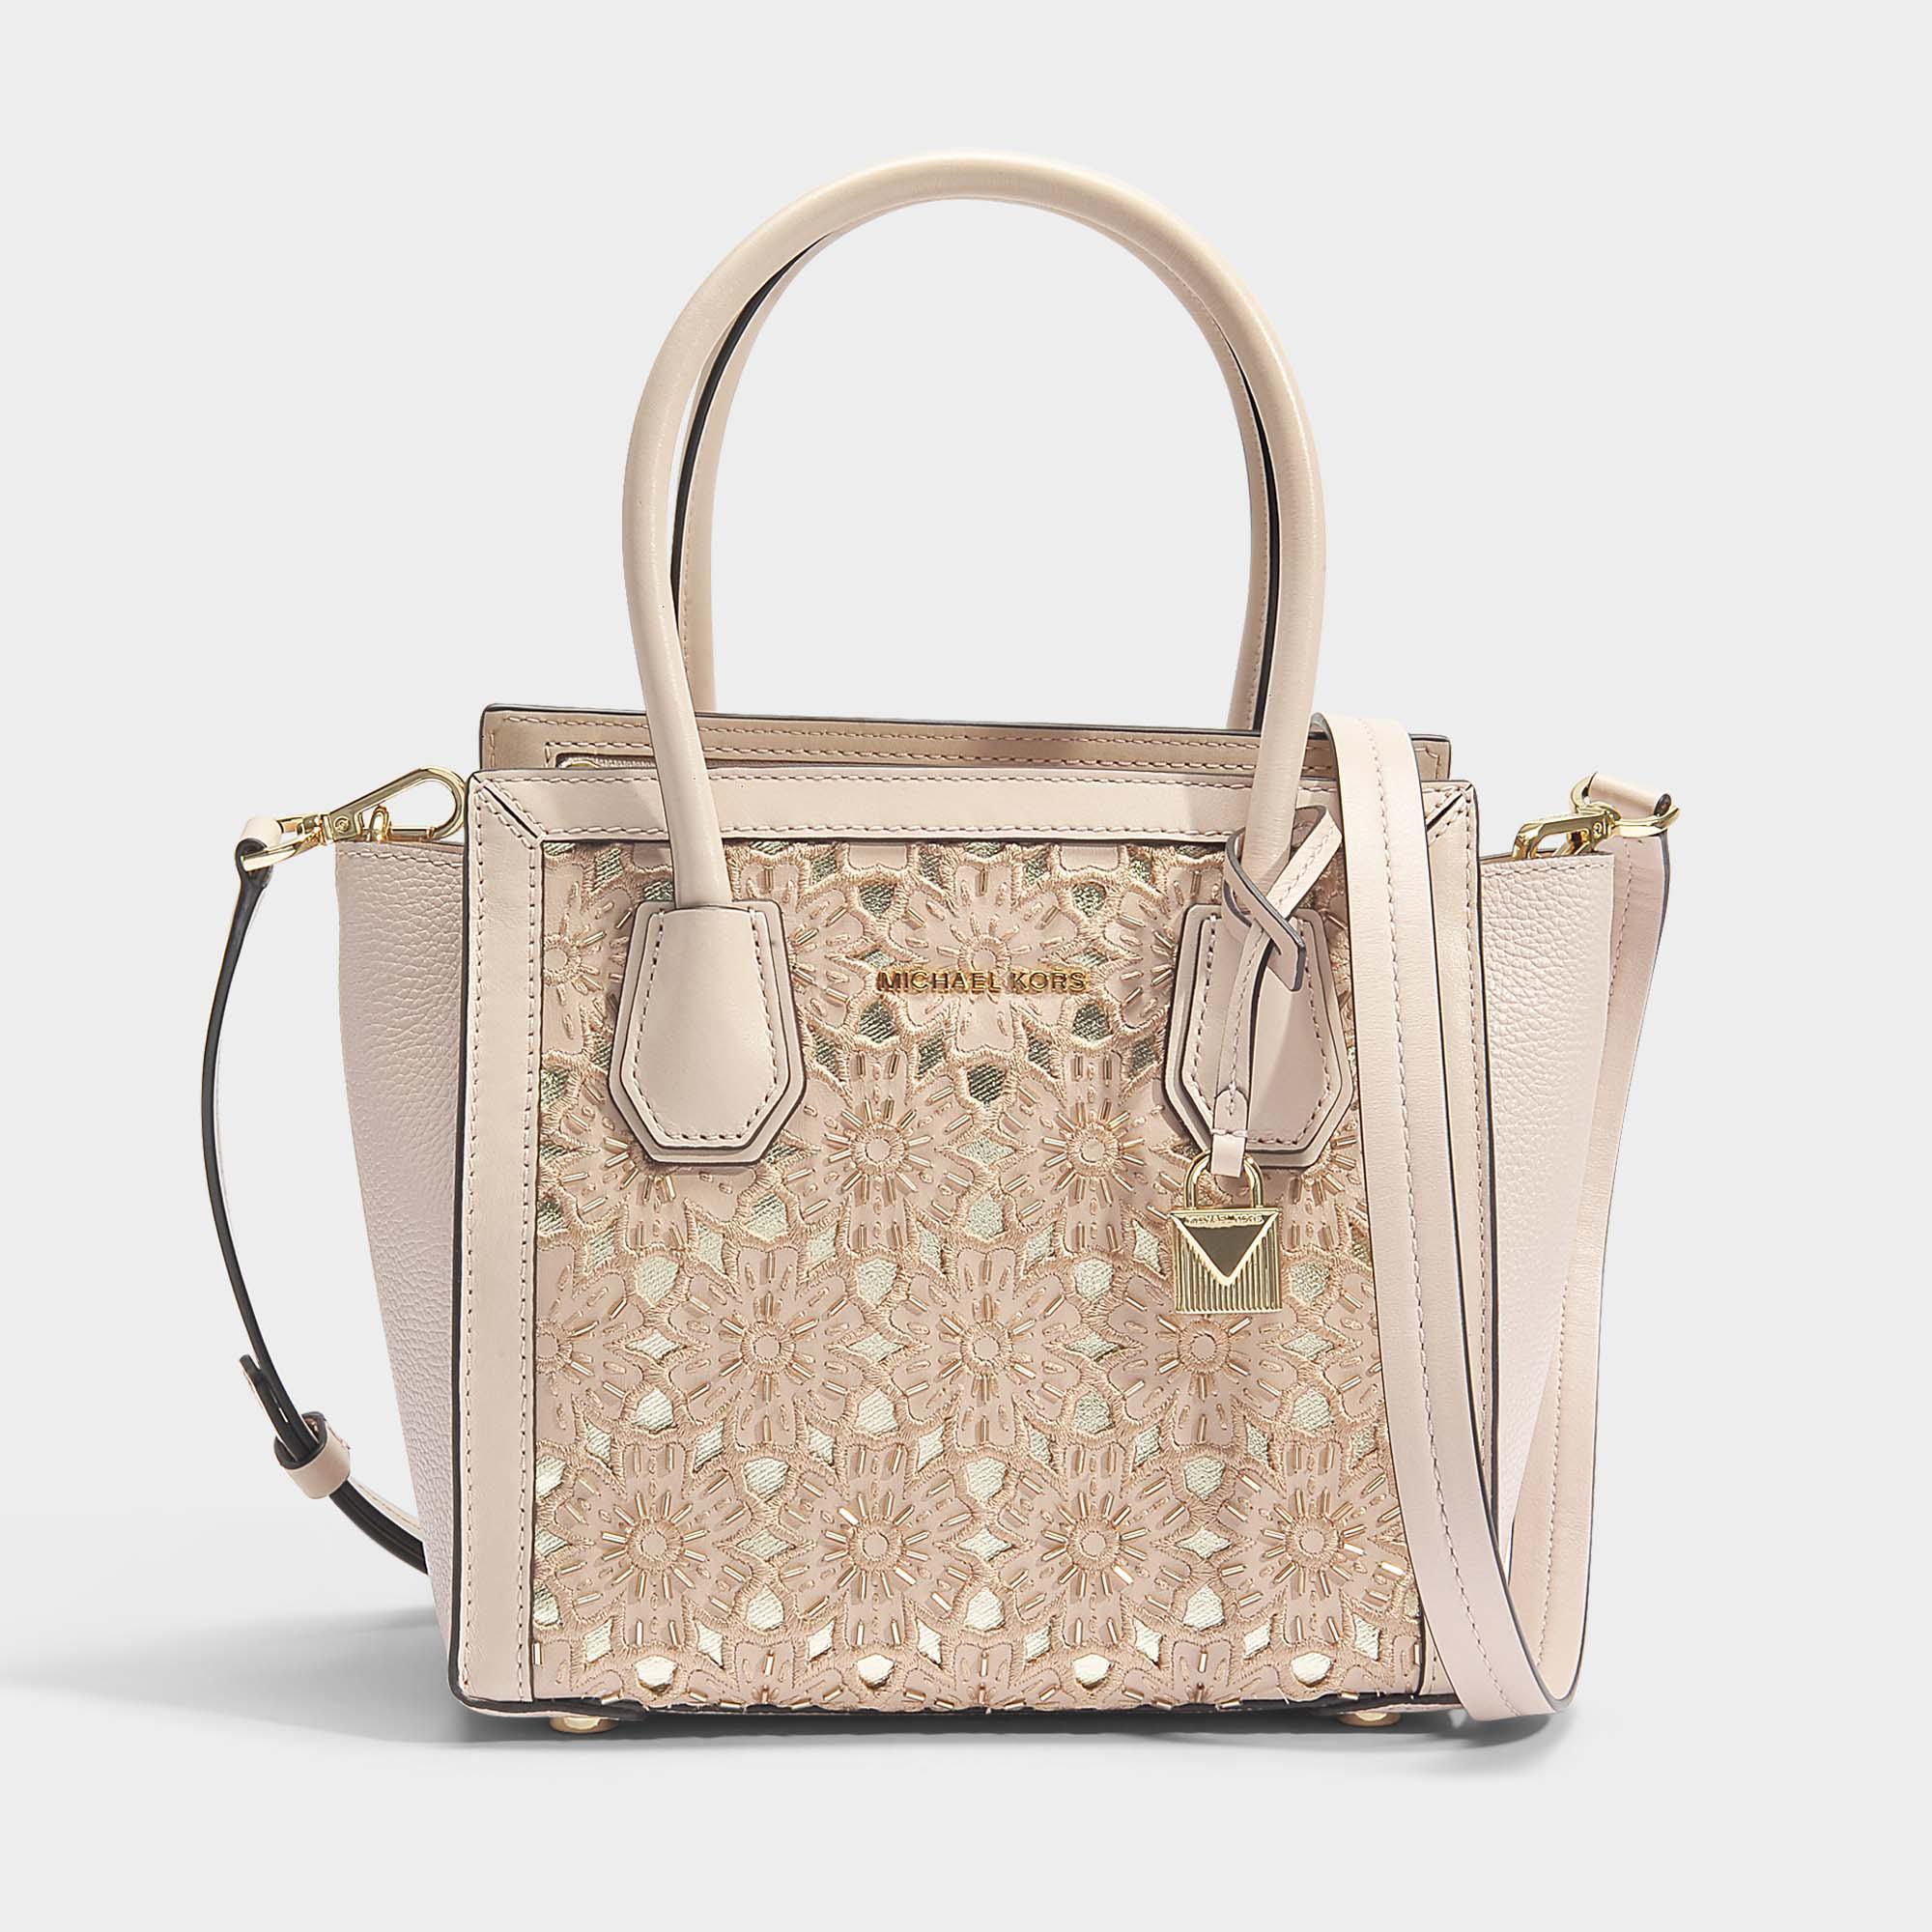 677ac0c26da5 Lyst - MICHAEL Michael Kors Mercer Studio Medium Messenger Bag In ...